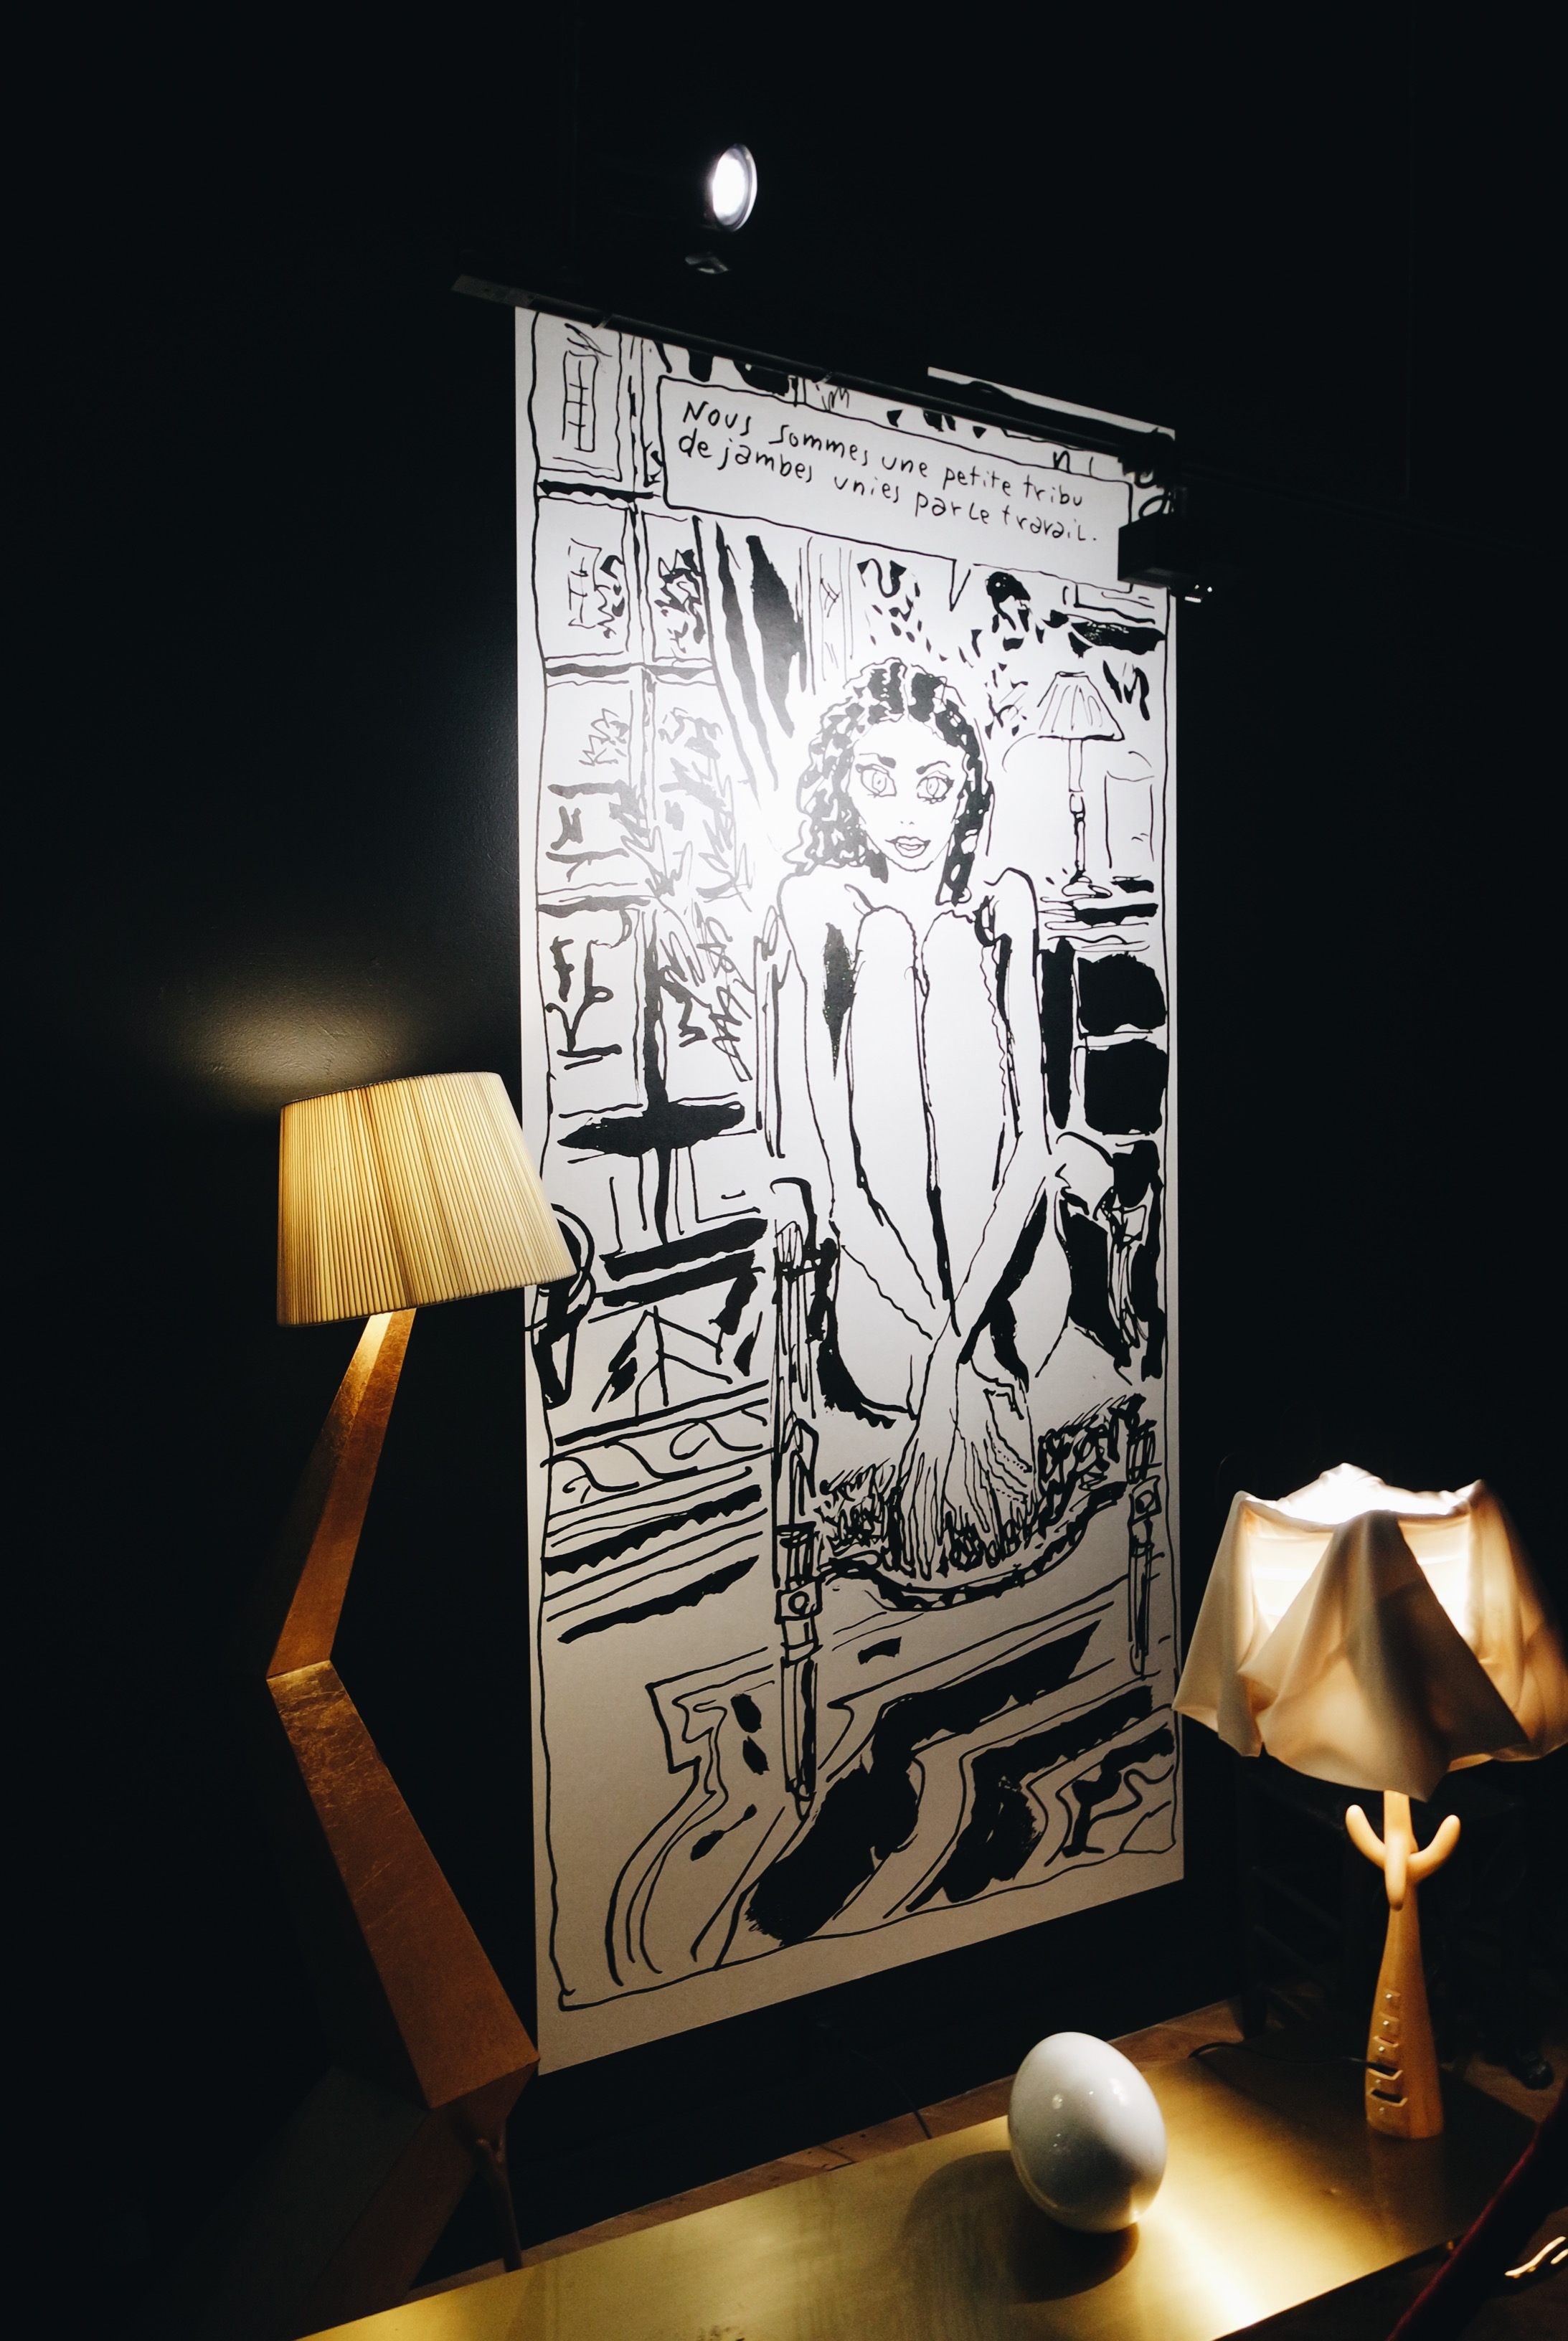 Salvador-Dali-lampes-Bracelli-Cajones-table-basse-Leda-dessin-Joann-Sfar-exposition-Espace-Dali-Paris-Montmartre